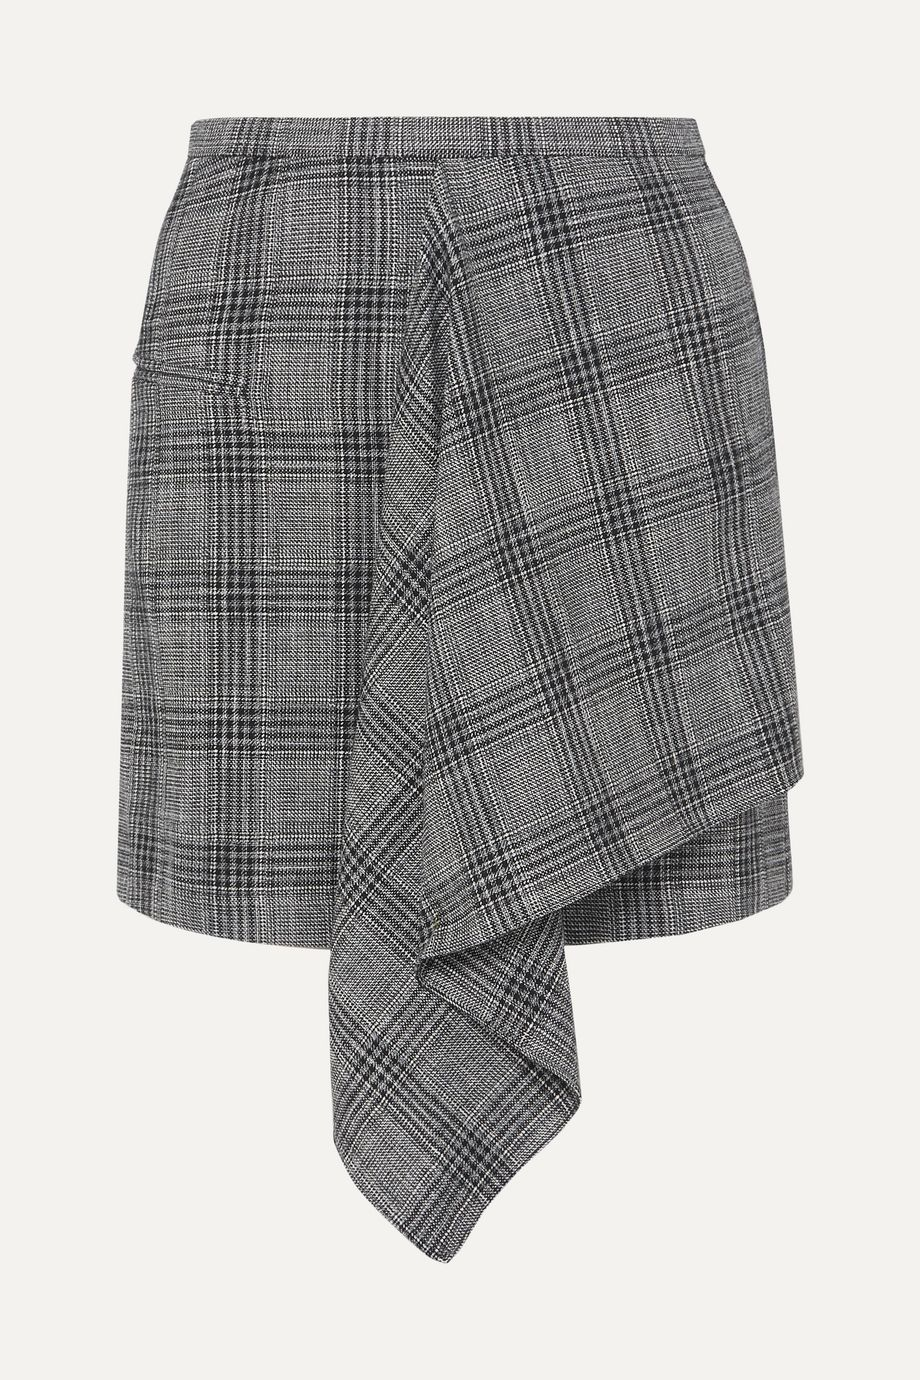 Isabel Marant Doleyli draped checked cotton-blend mini skirt